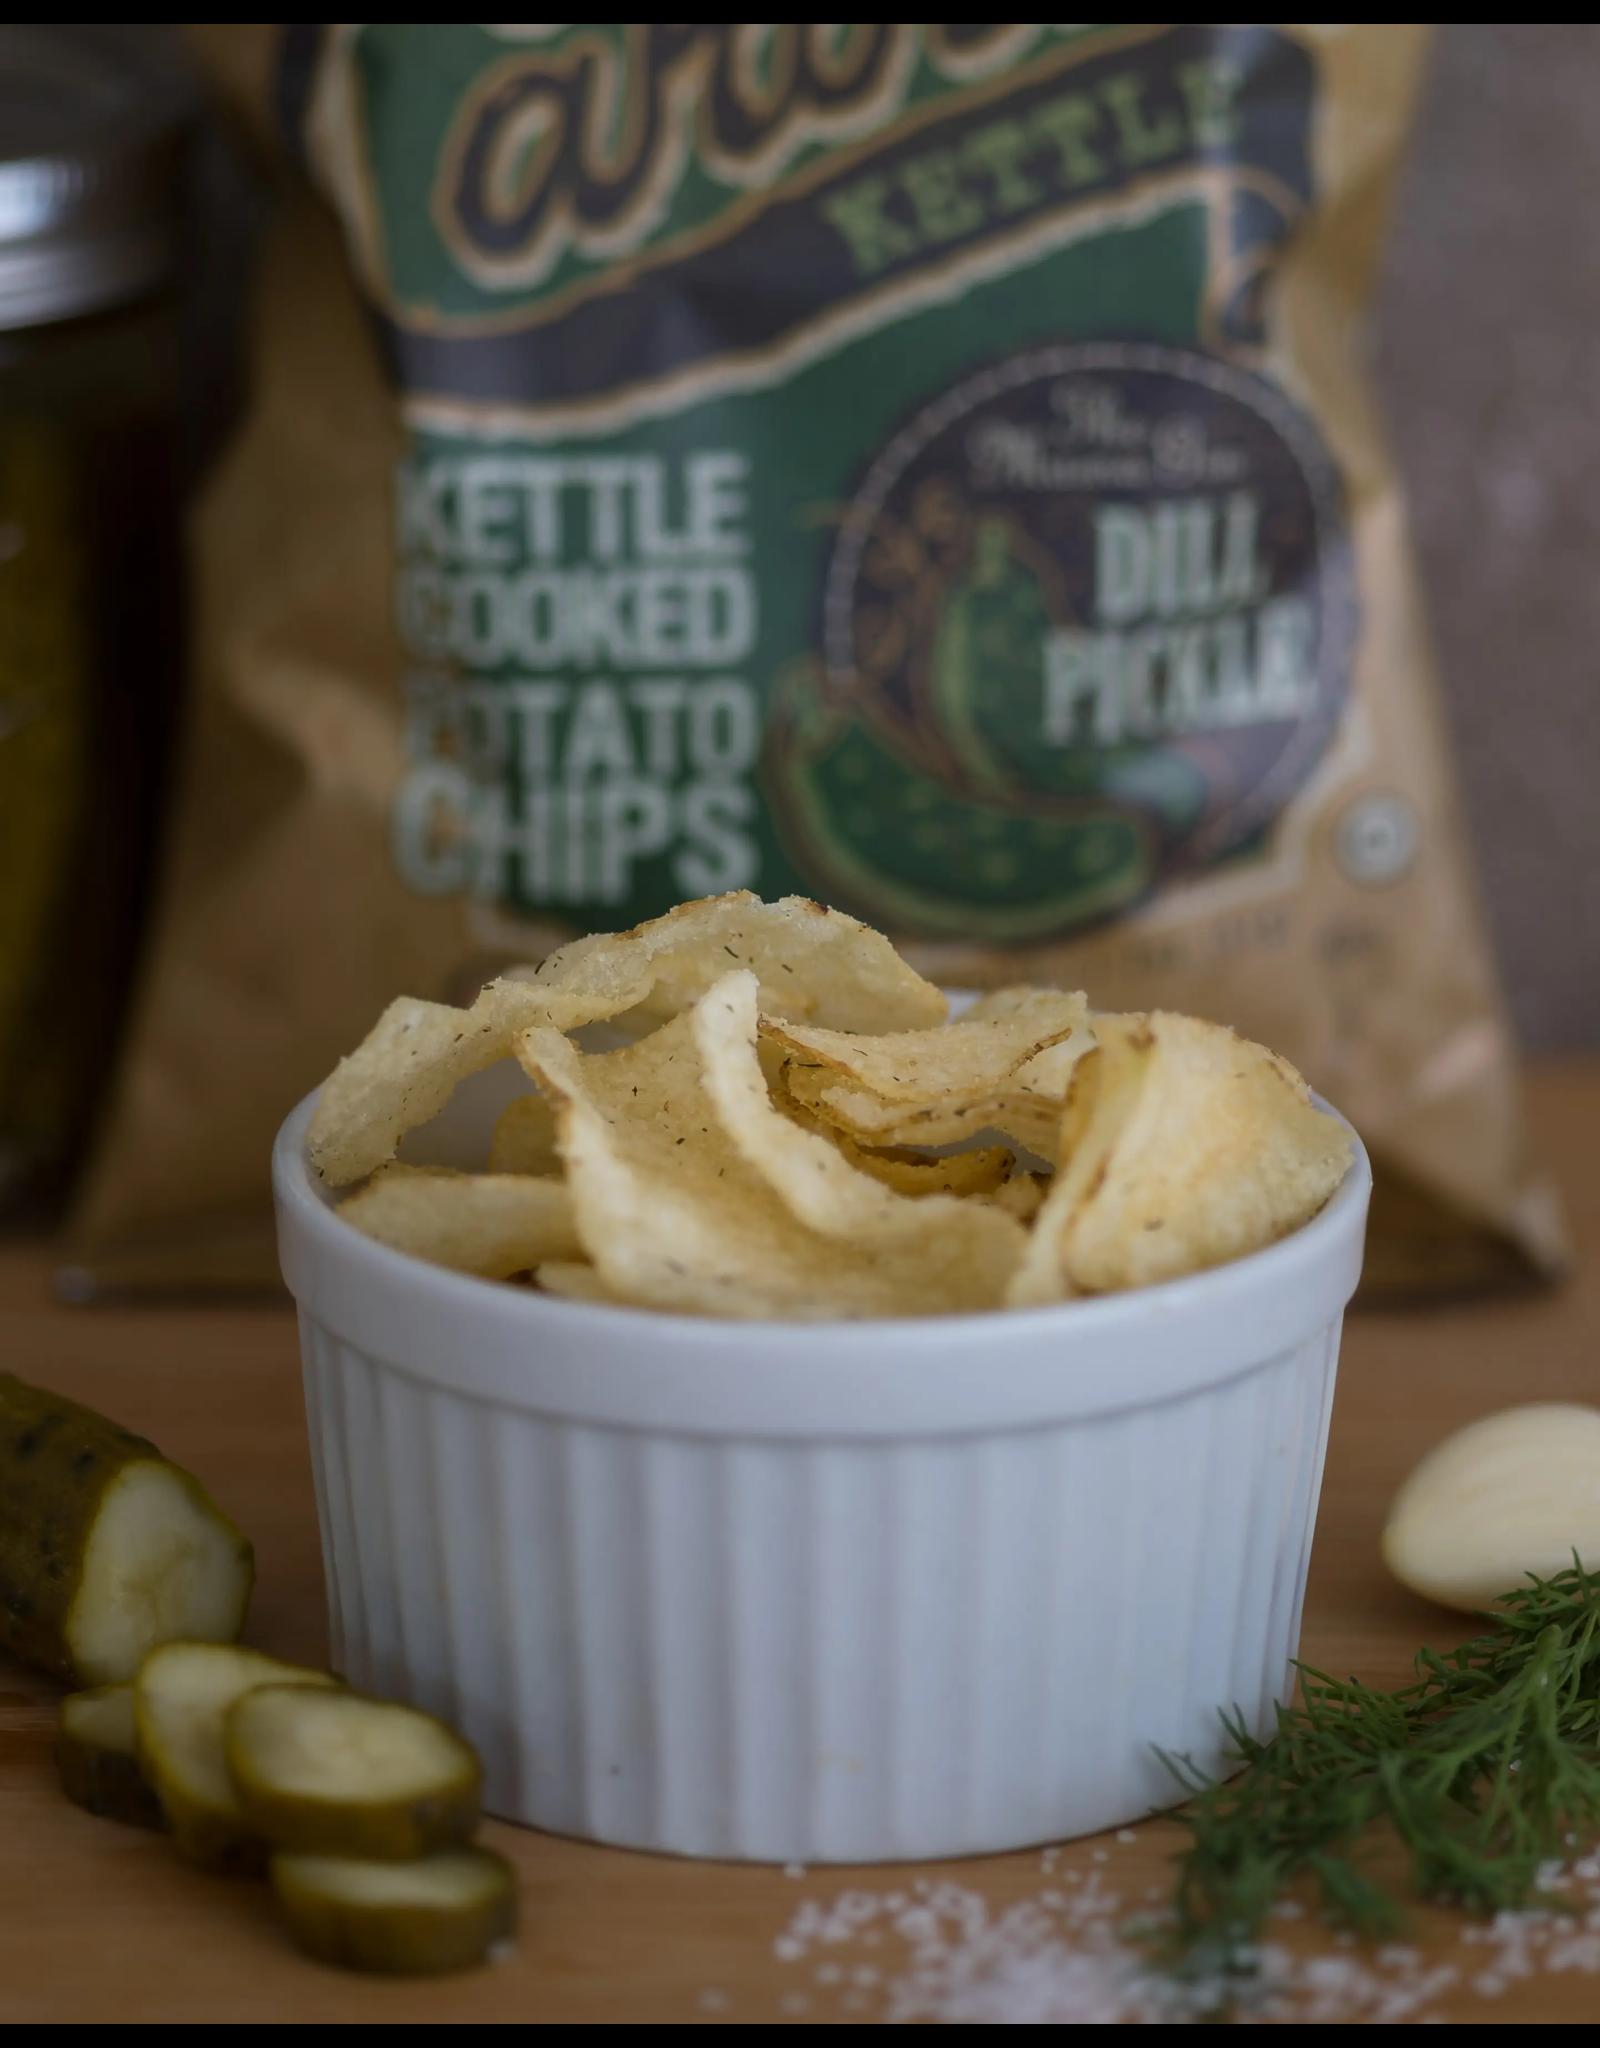 2 oz. Dill Pickle Carolina Kettle Chips